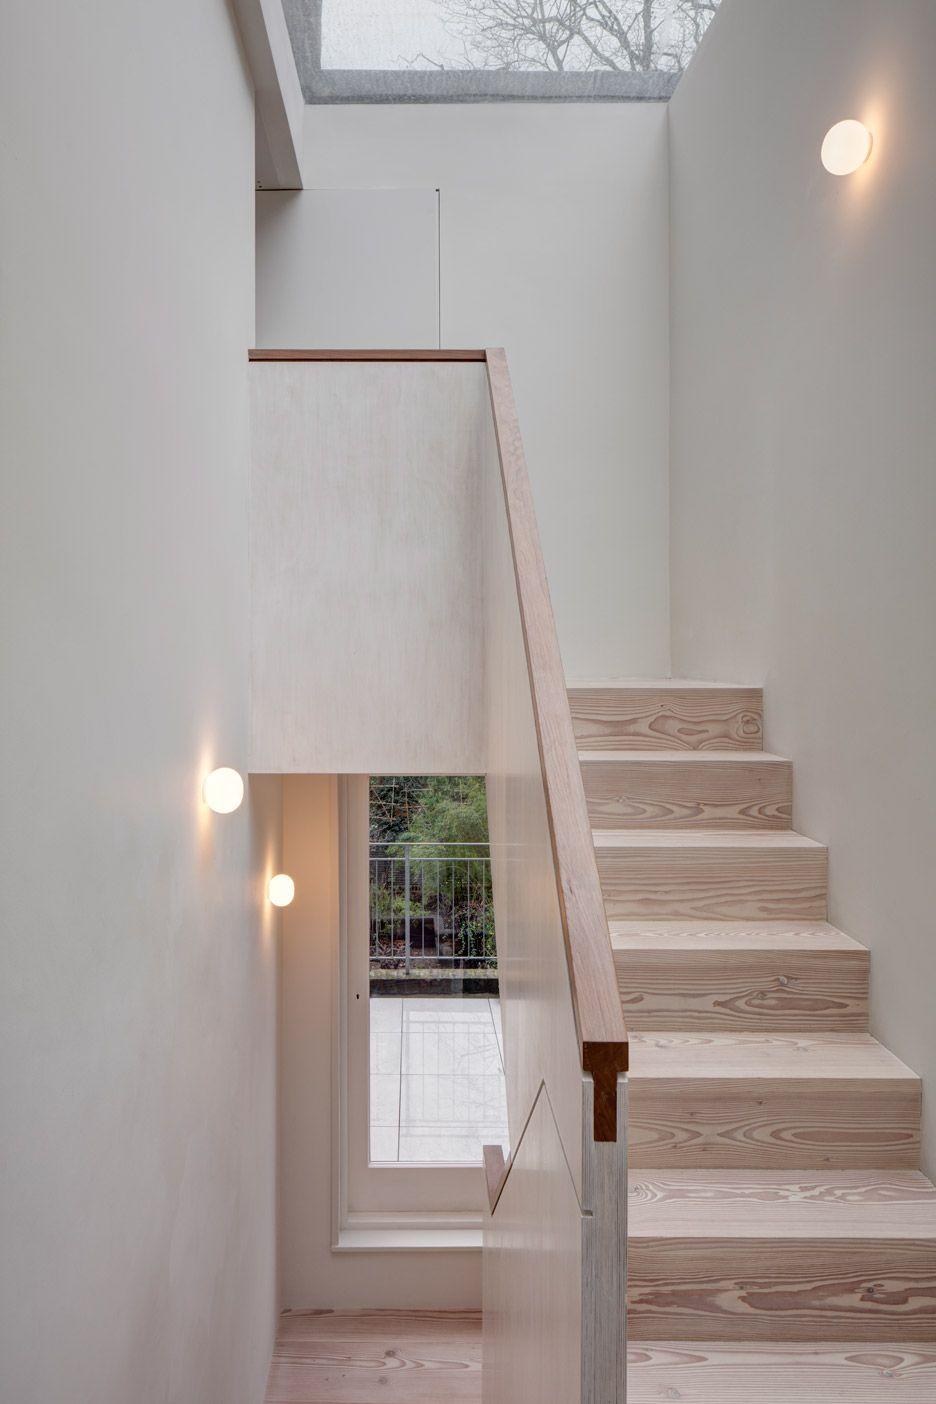 Best Apa Creates Warehouse Inspired Interior For Refurbished 400 x 300